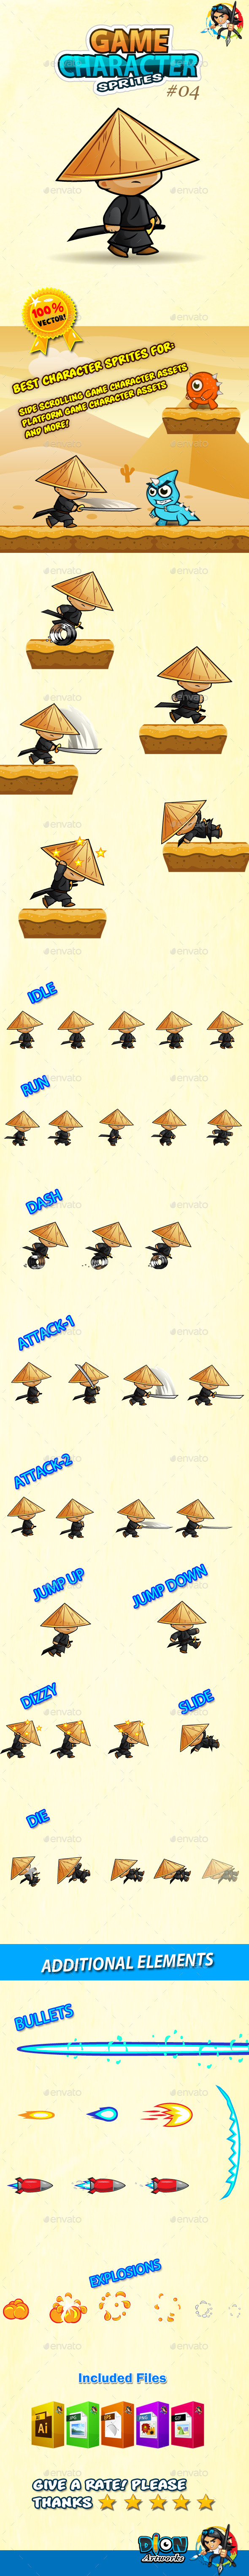 GraphicRiver Samurai Character Sprites O4 10696994